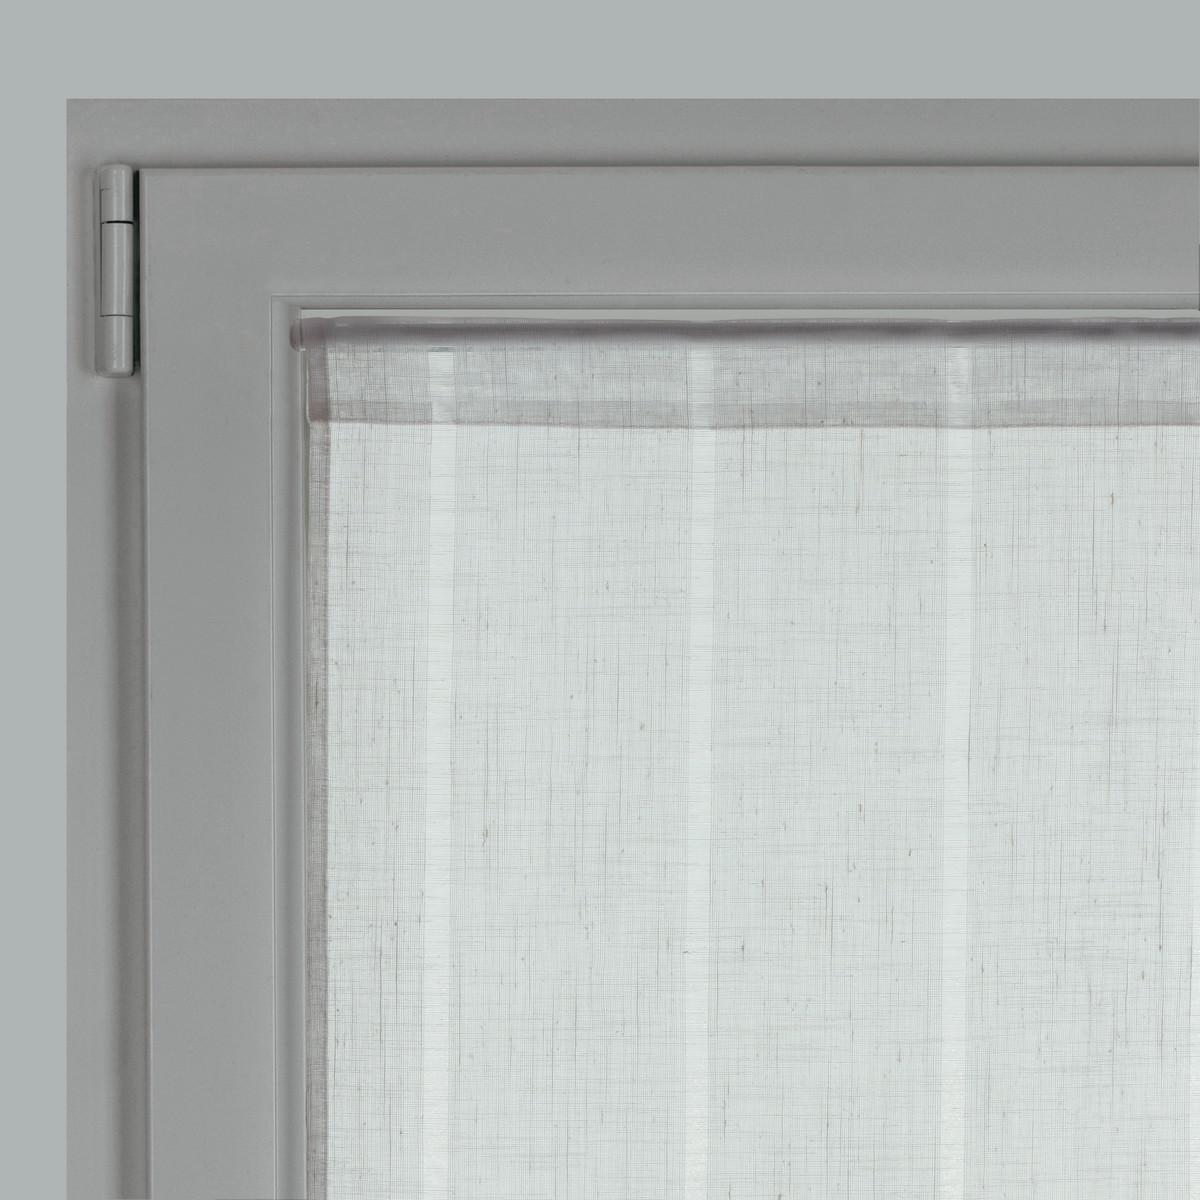 Tendine vetro: prezzi e offerte online per tendine vetro